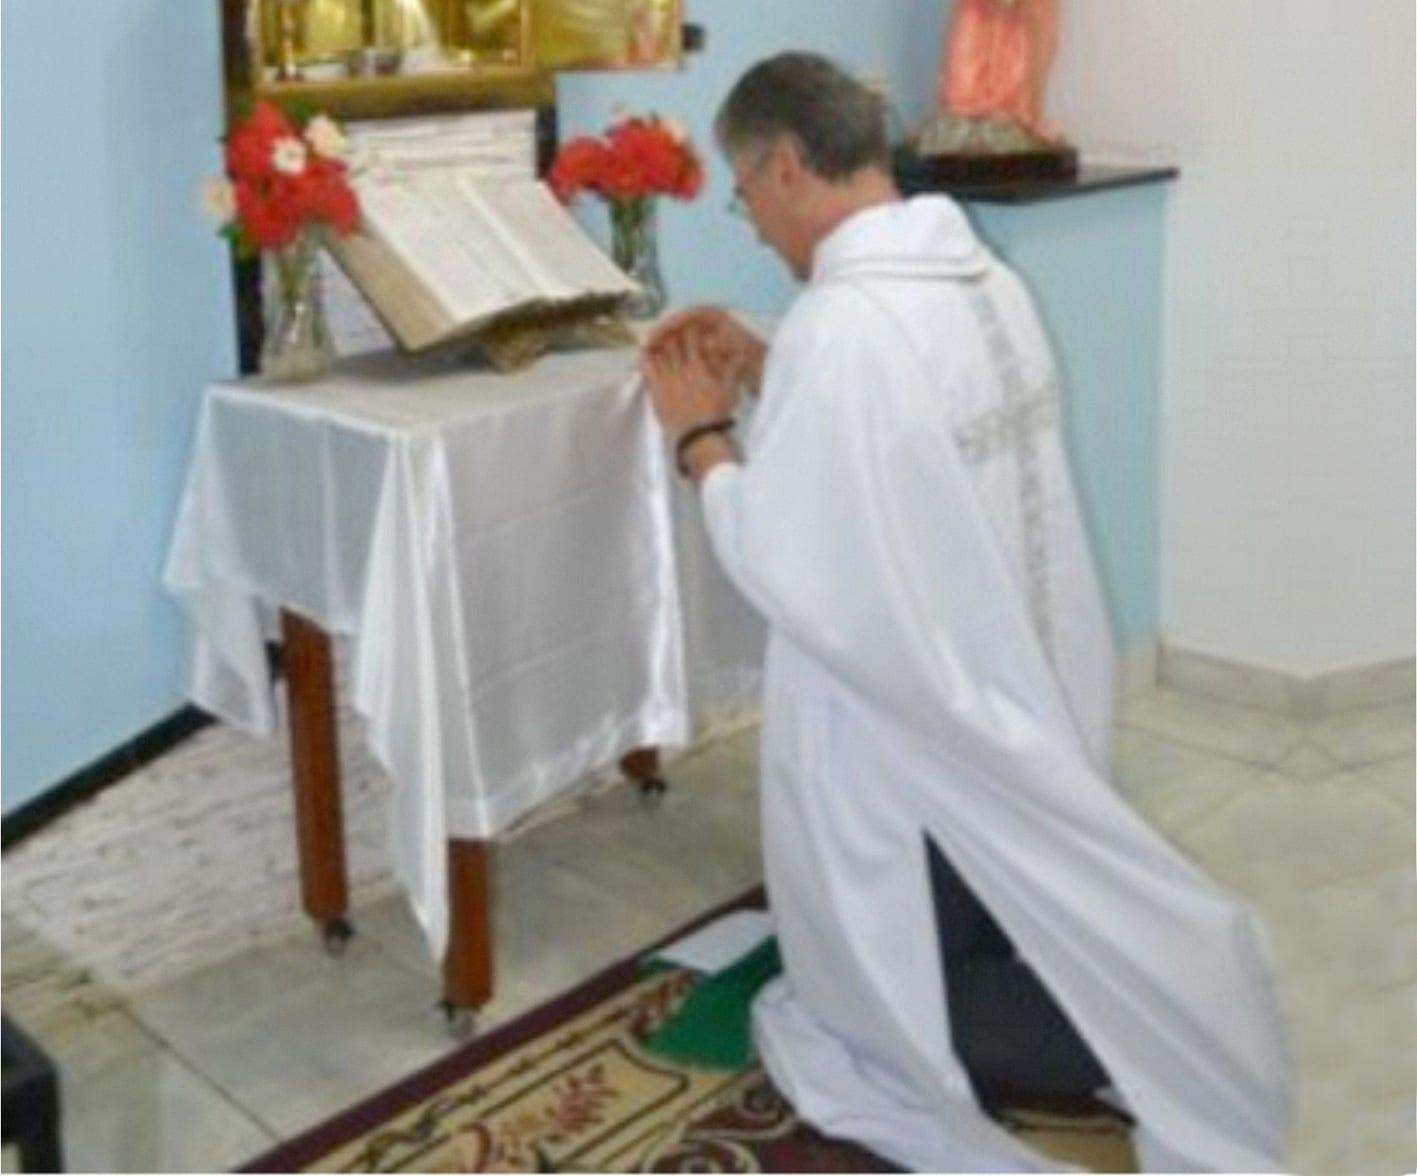 Padre José Neiva assume a Paróquia de Safira